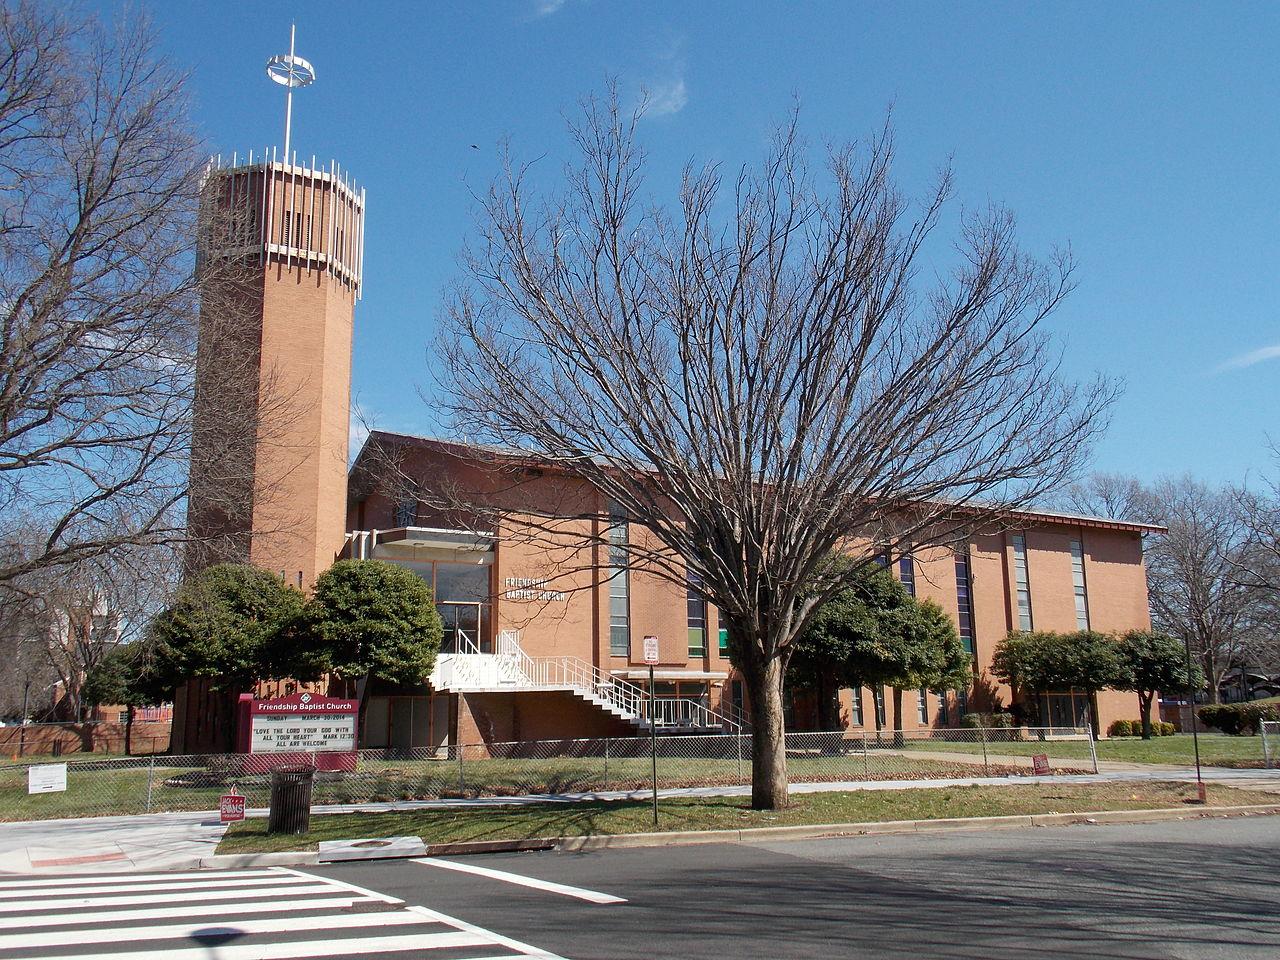 Description And Objective Of Friendship Baptist Church